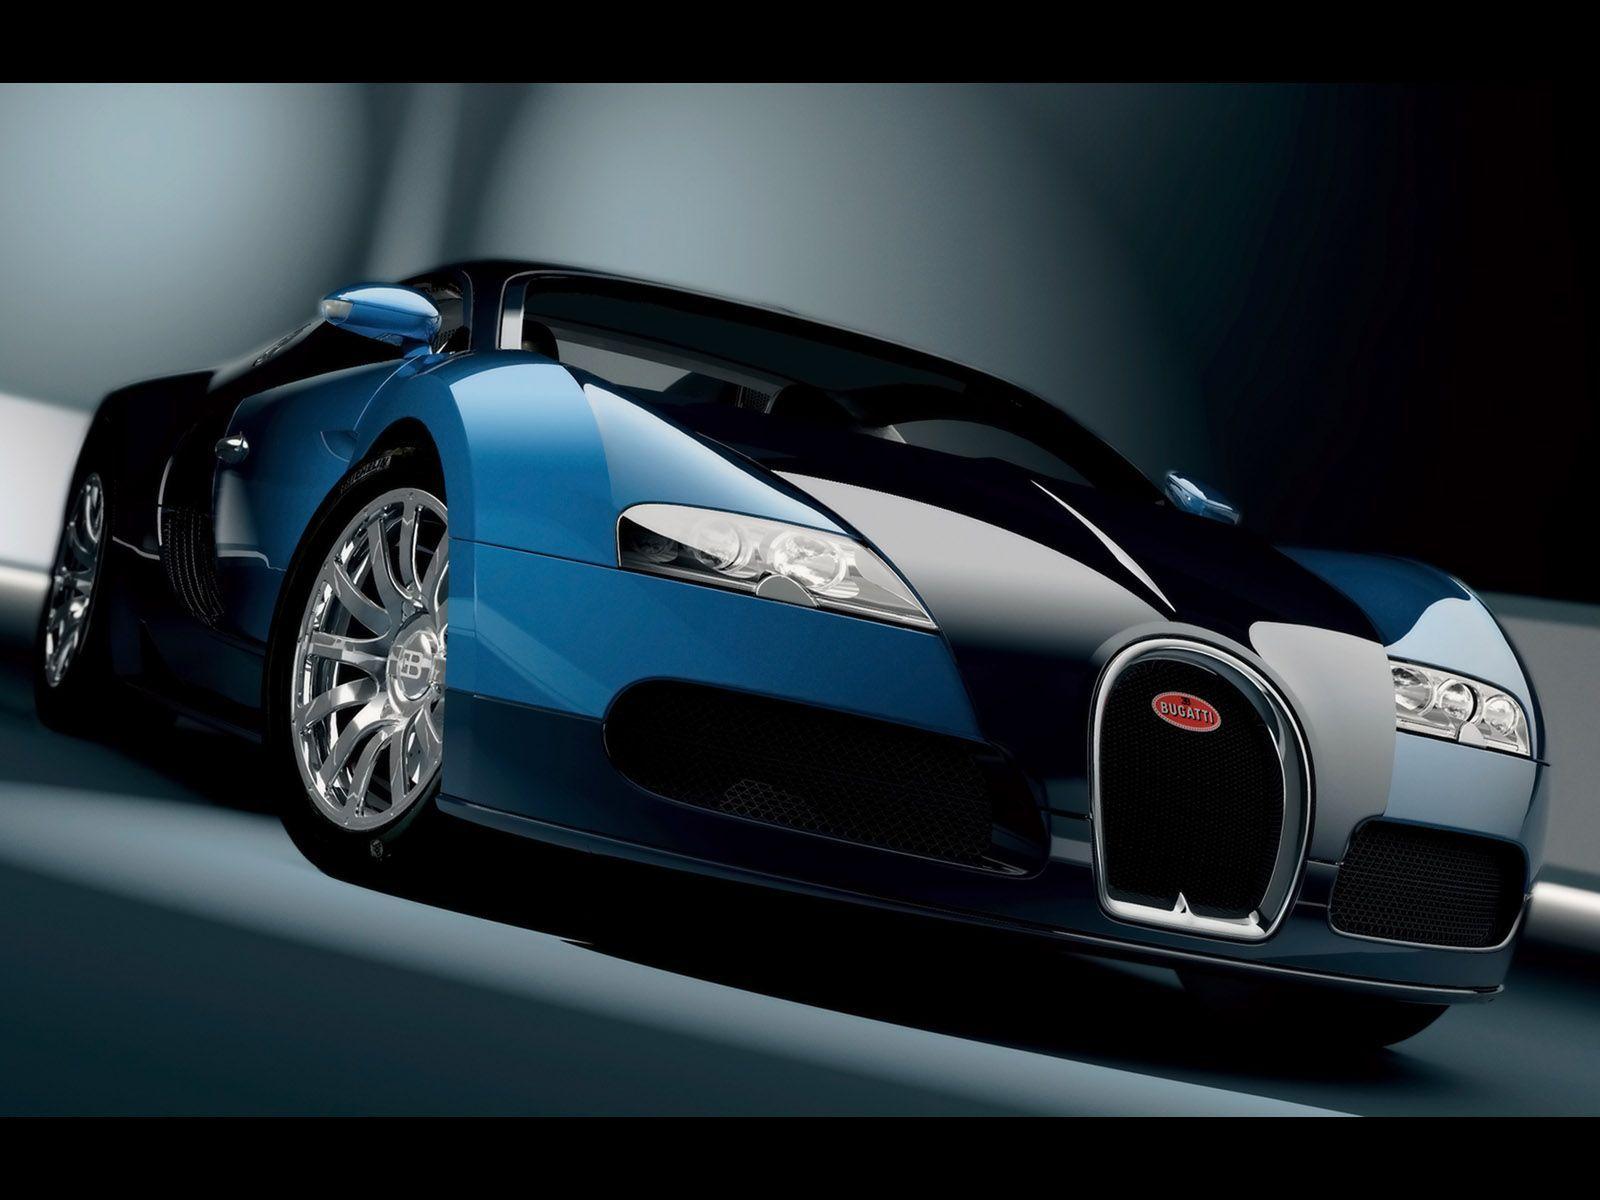 238d506536396829a23ea7ba44783ddd Stunning Bugatti Veyron Price In Brazil Cars Trend